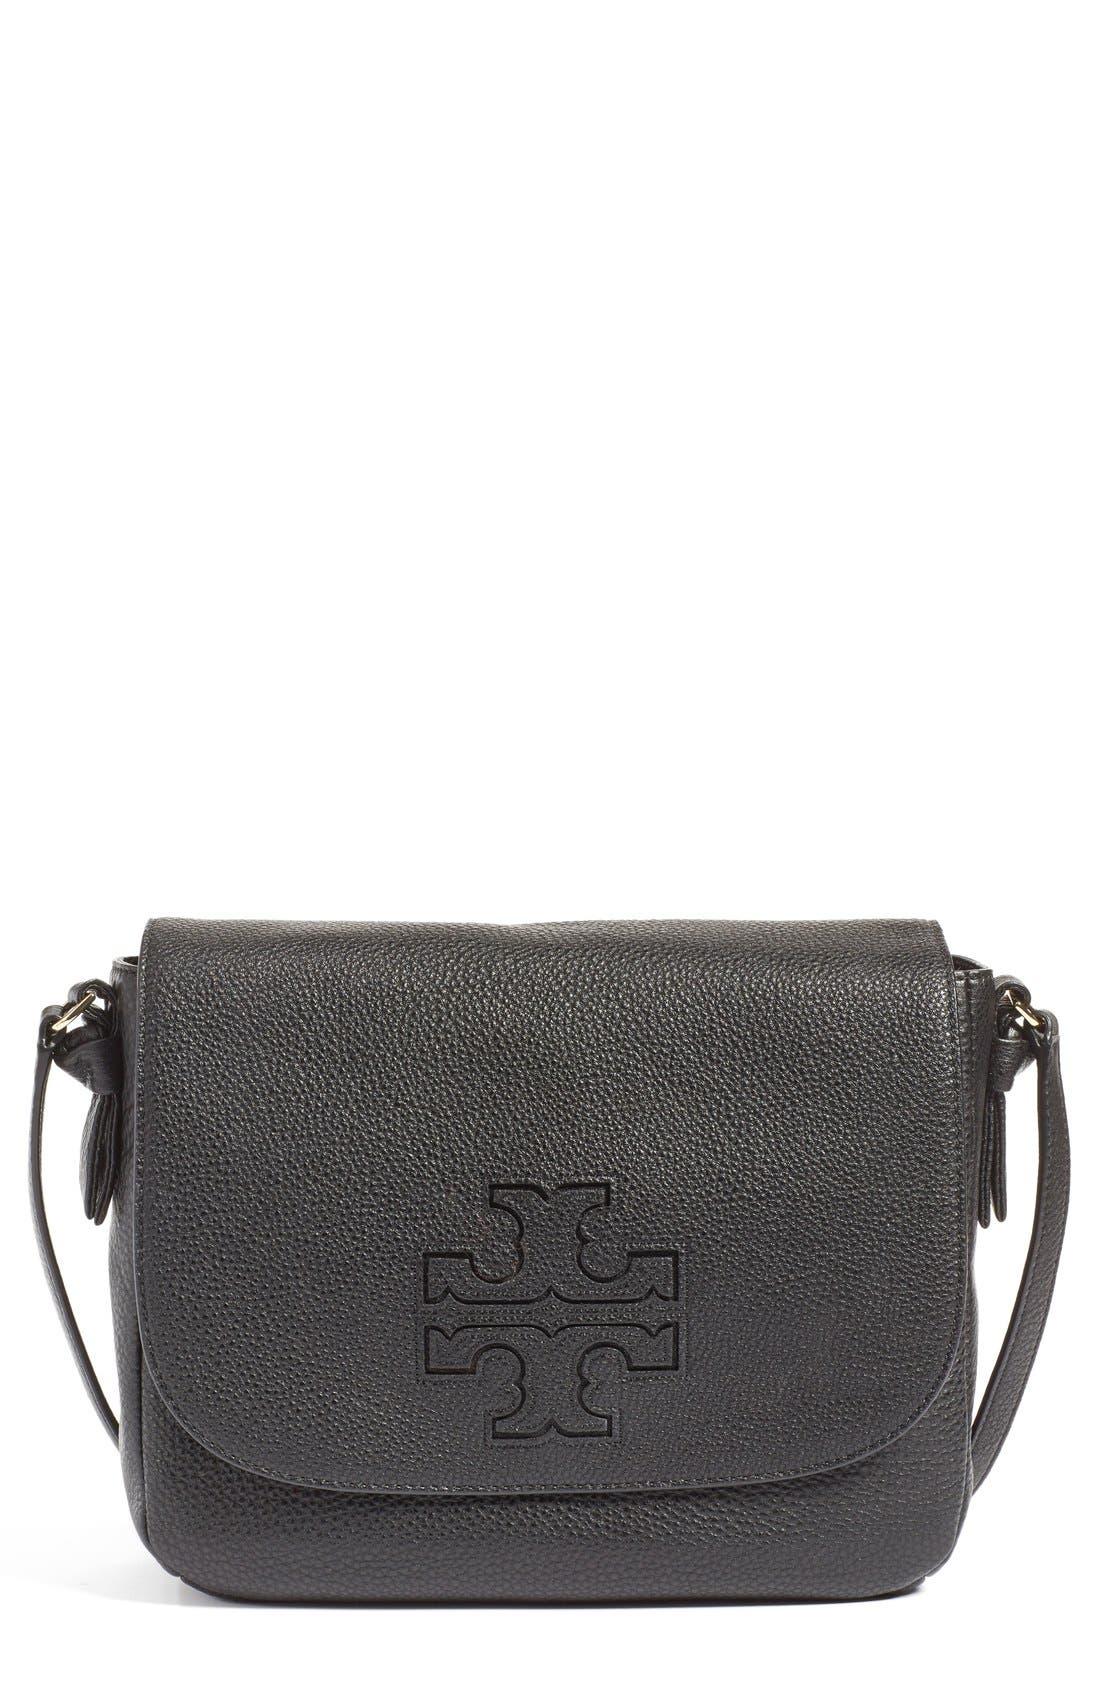 'Harper' Leather Crossbody Bag, Main, color, 012